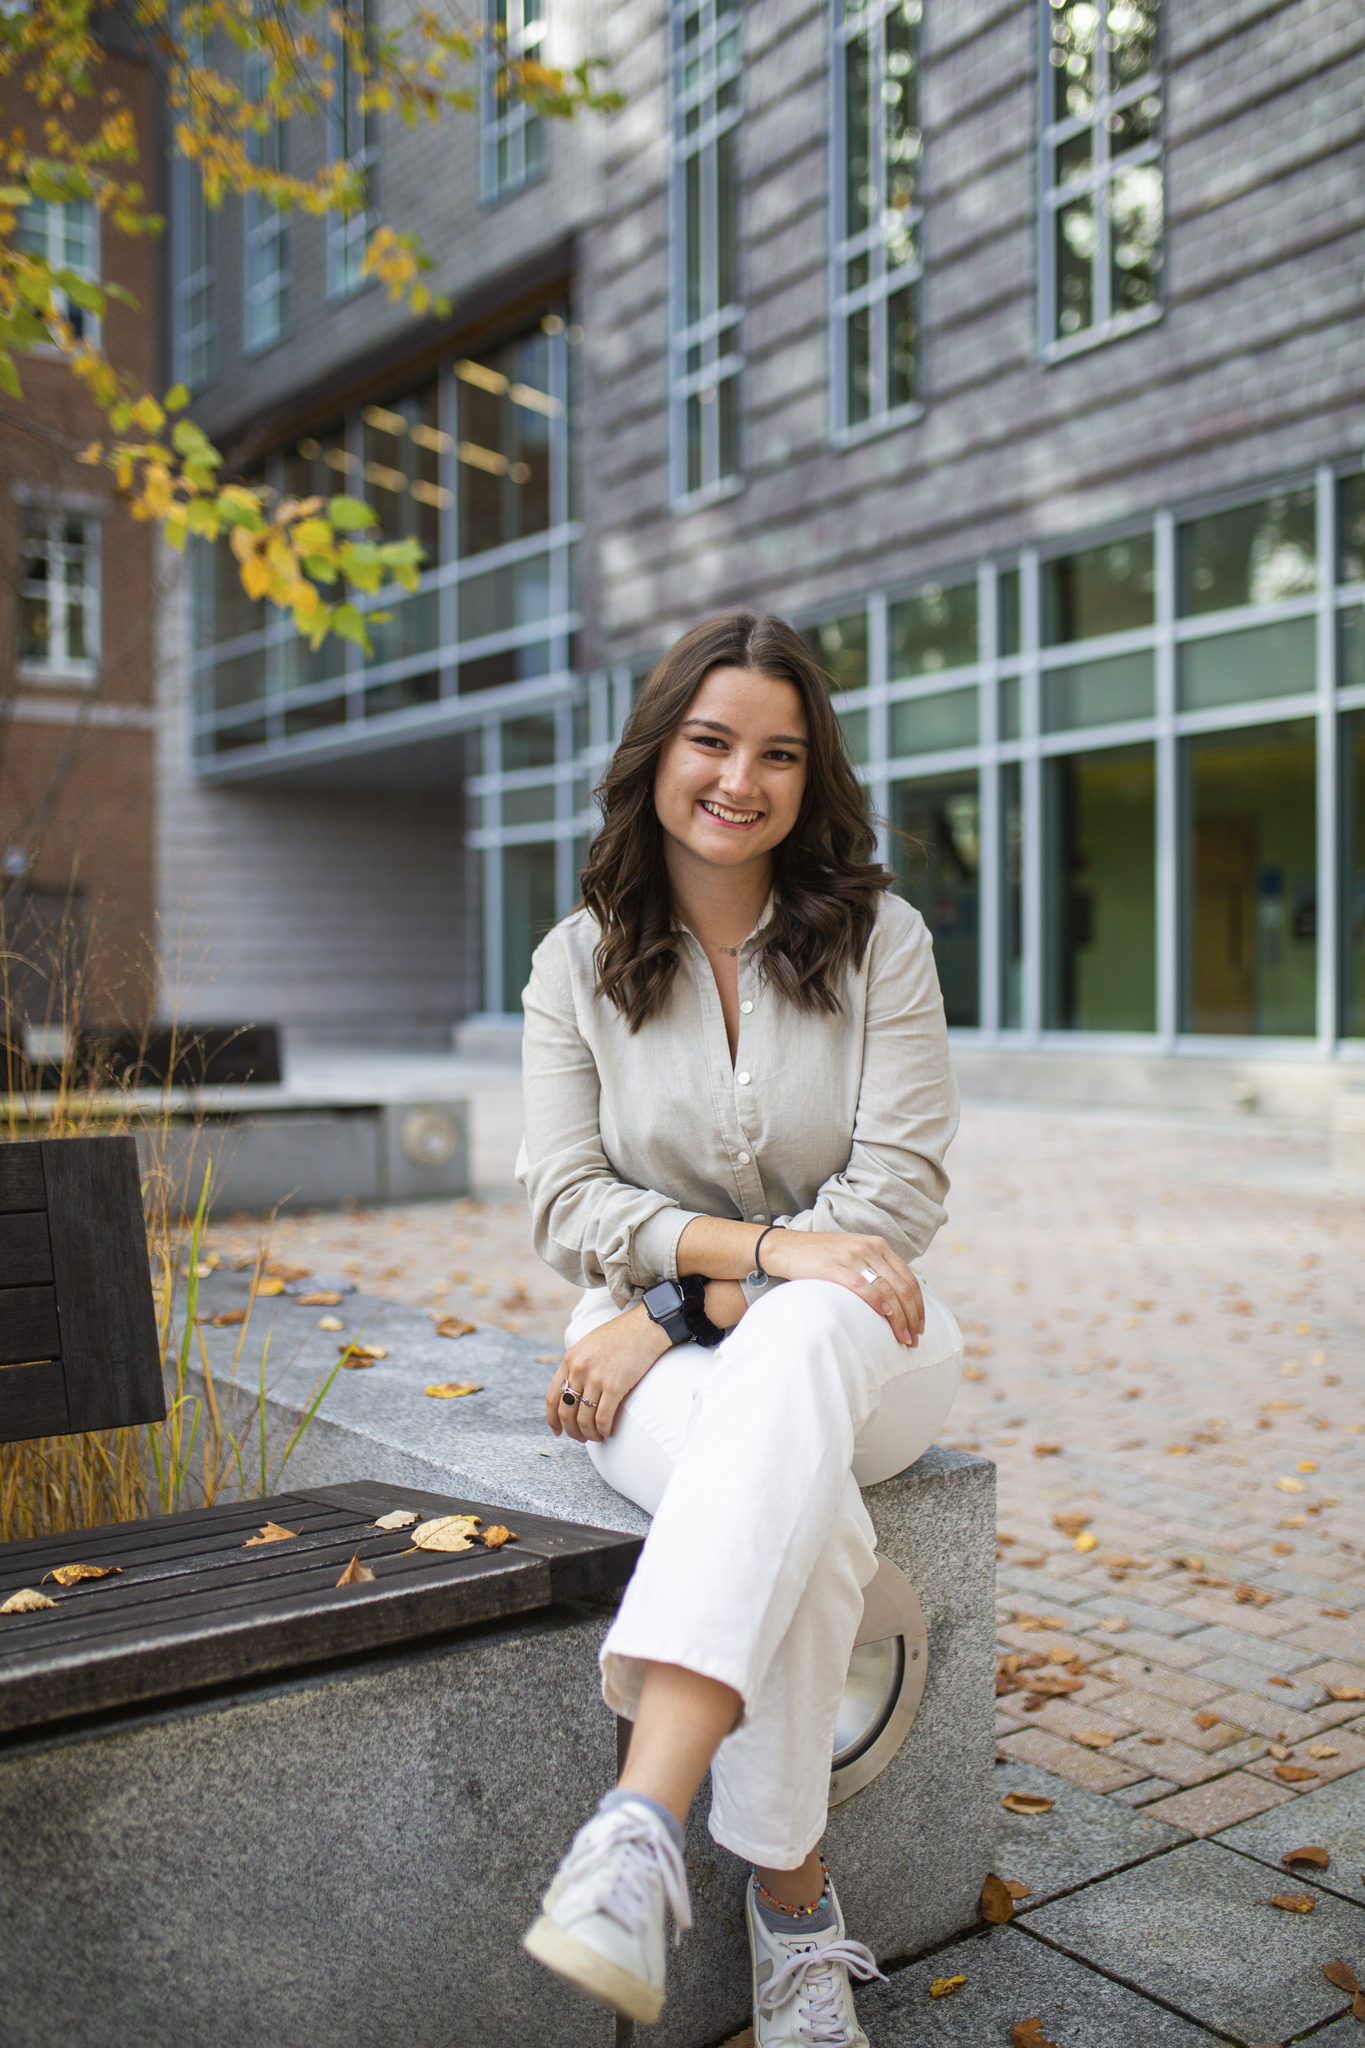 Katharina_Barta_full-time_MBA_student